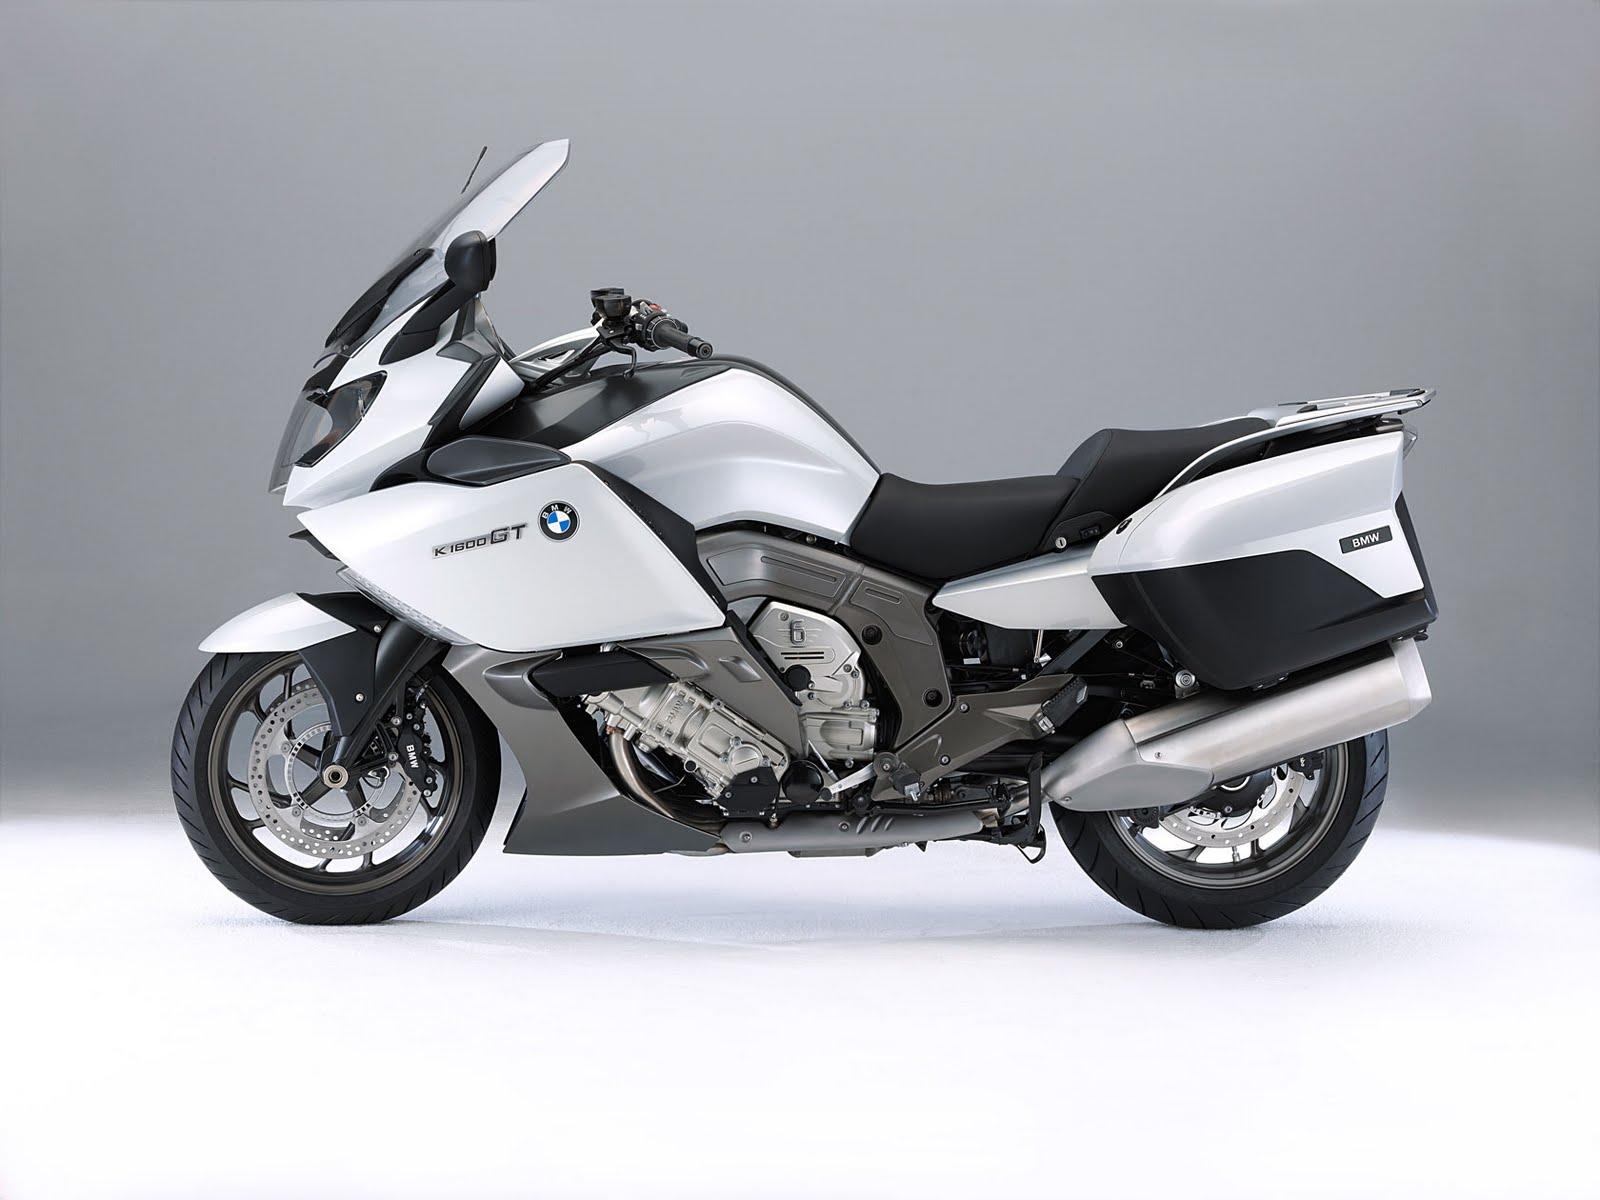 http://2.bp.blogspot.com/_J3_liDBfbvs/TKxwvD336hI/AAAAAAAAyzM/pNEW92Khq_s/s1600/2011+BMW+K1600GT+Photos.jpg